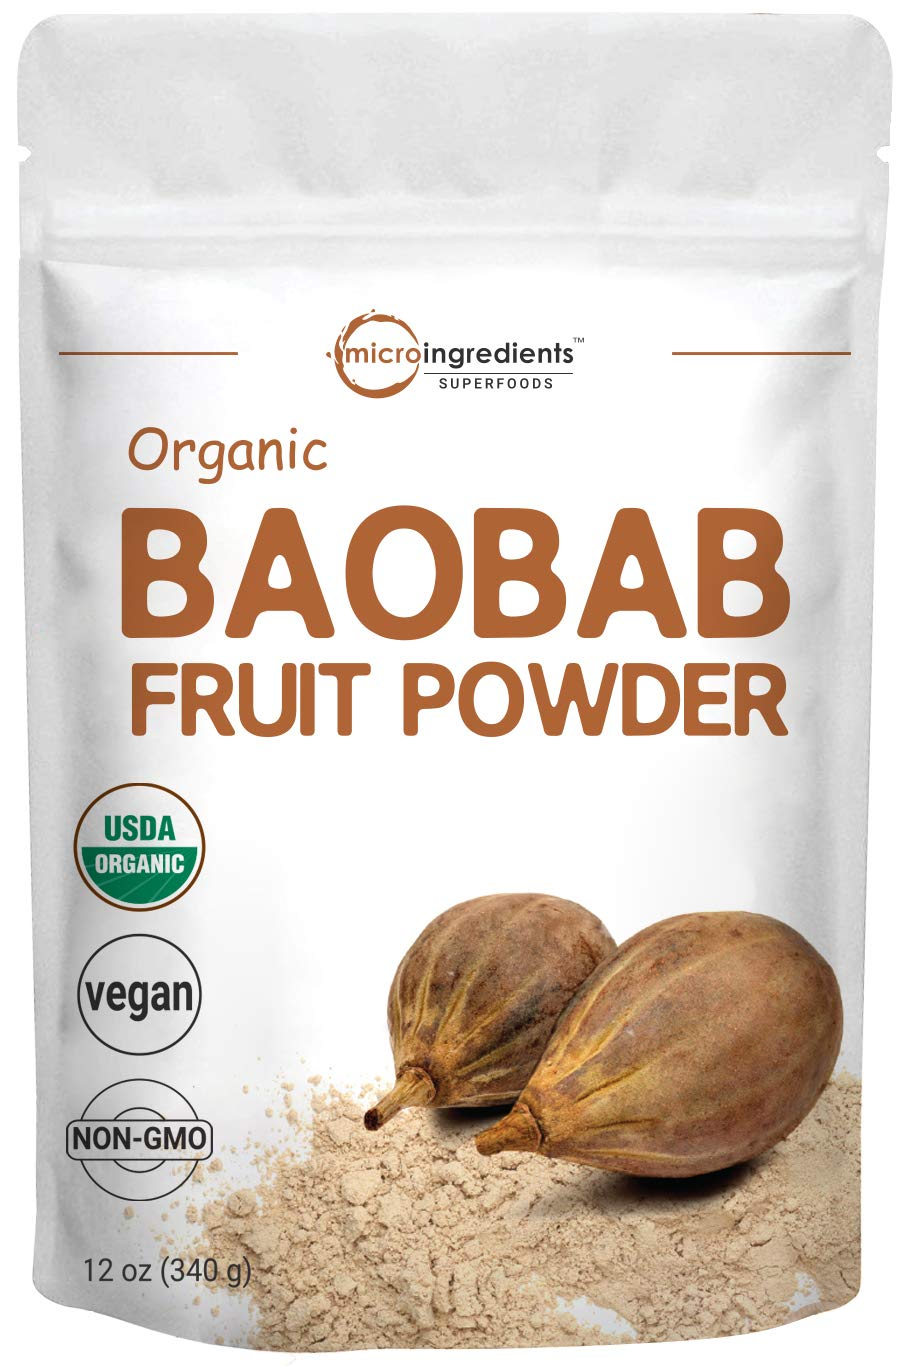 Organic Baobab Powder, 12 Ounce, Immune Vitamin C Powder, Natural Antioxidant, Flavonoids and Fatty Acid, Enhance Energy and Immune System, Non-GMO and Vegan Friendly